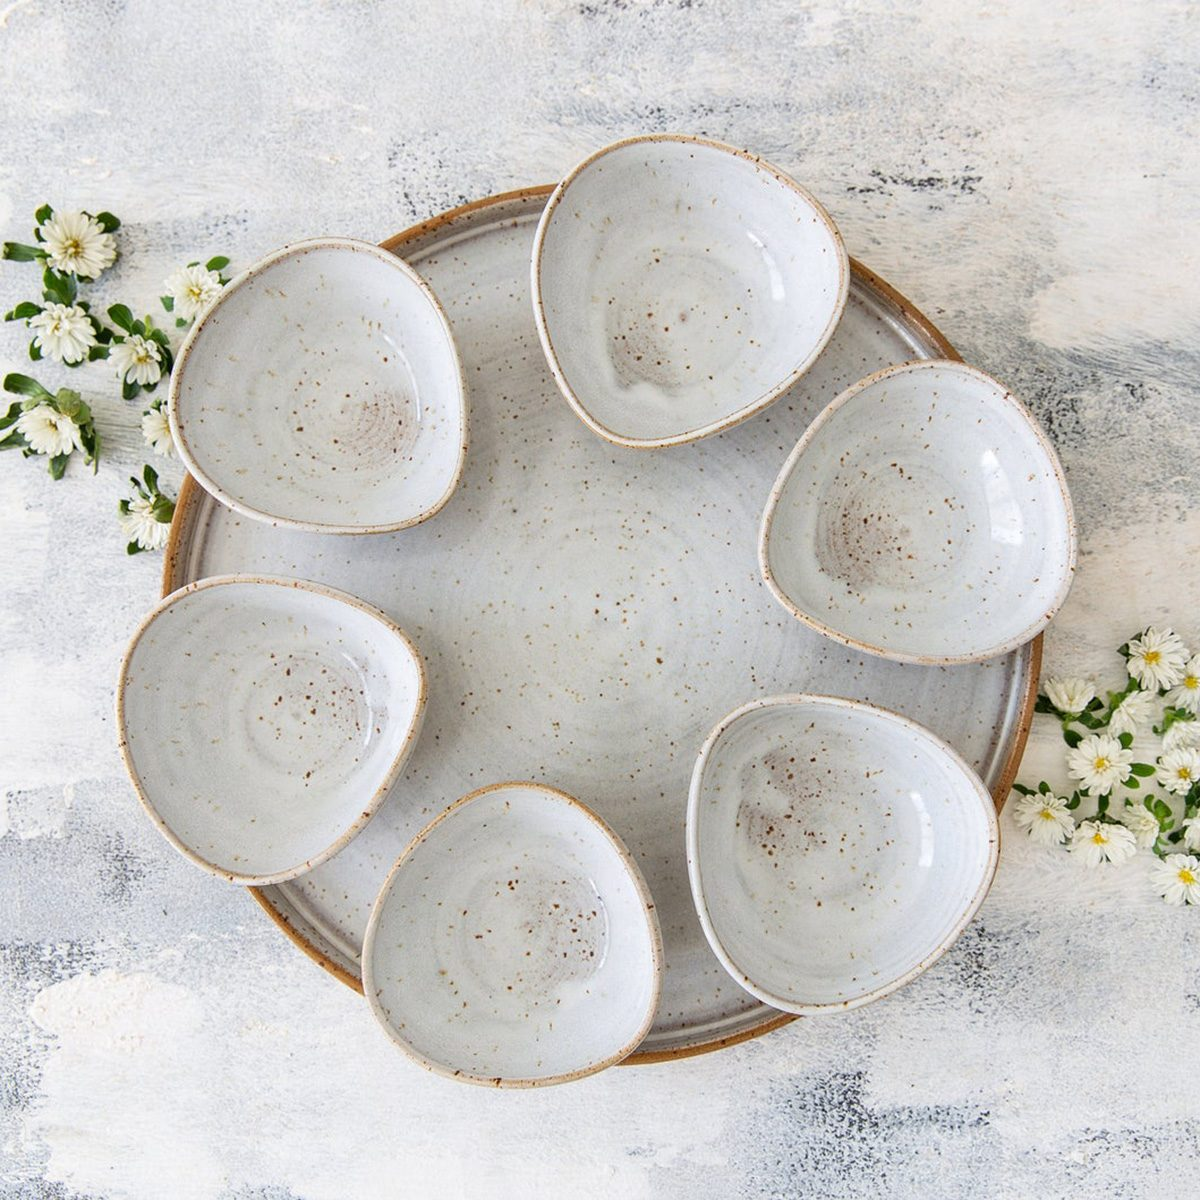 13 Gorgeous Seder Plates For Celebrating Passover